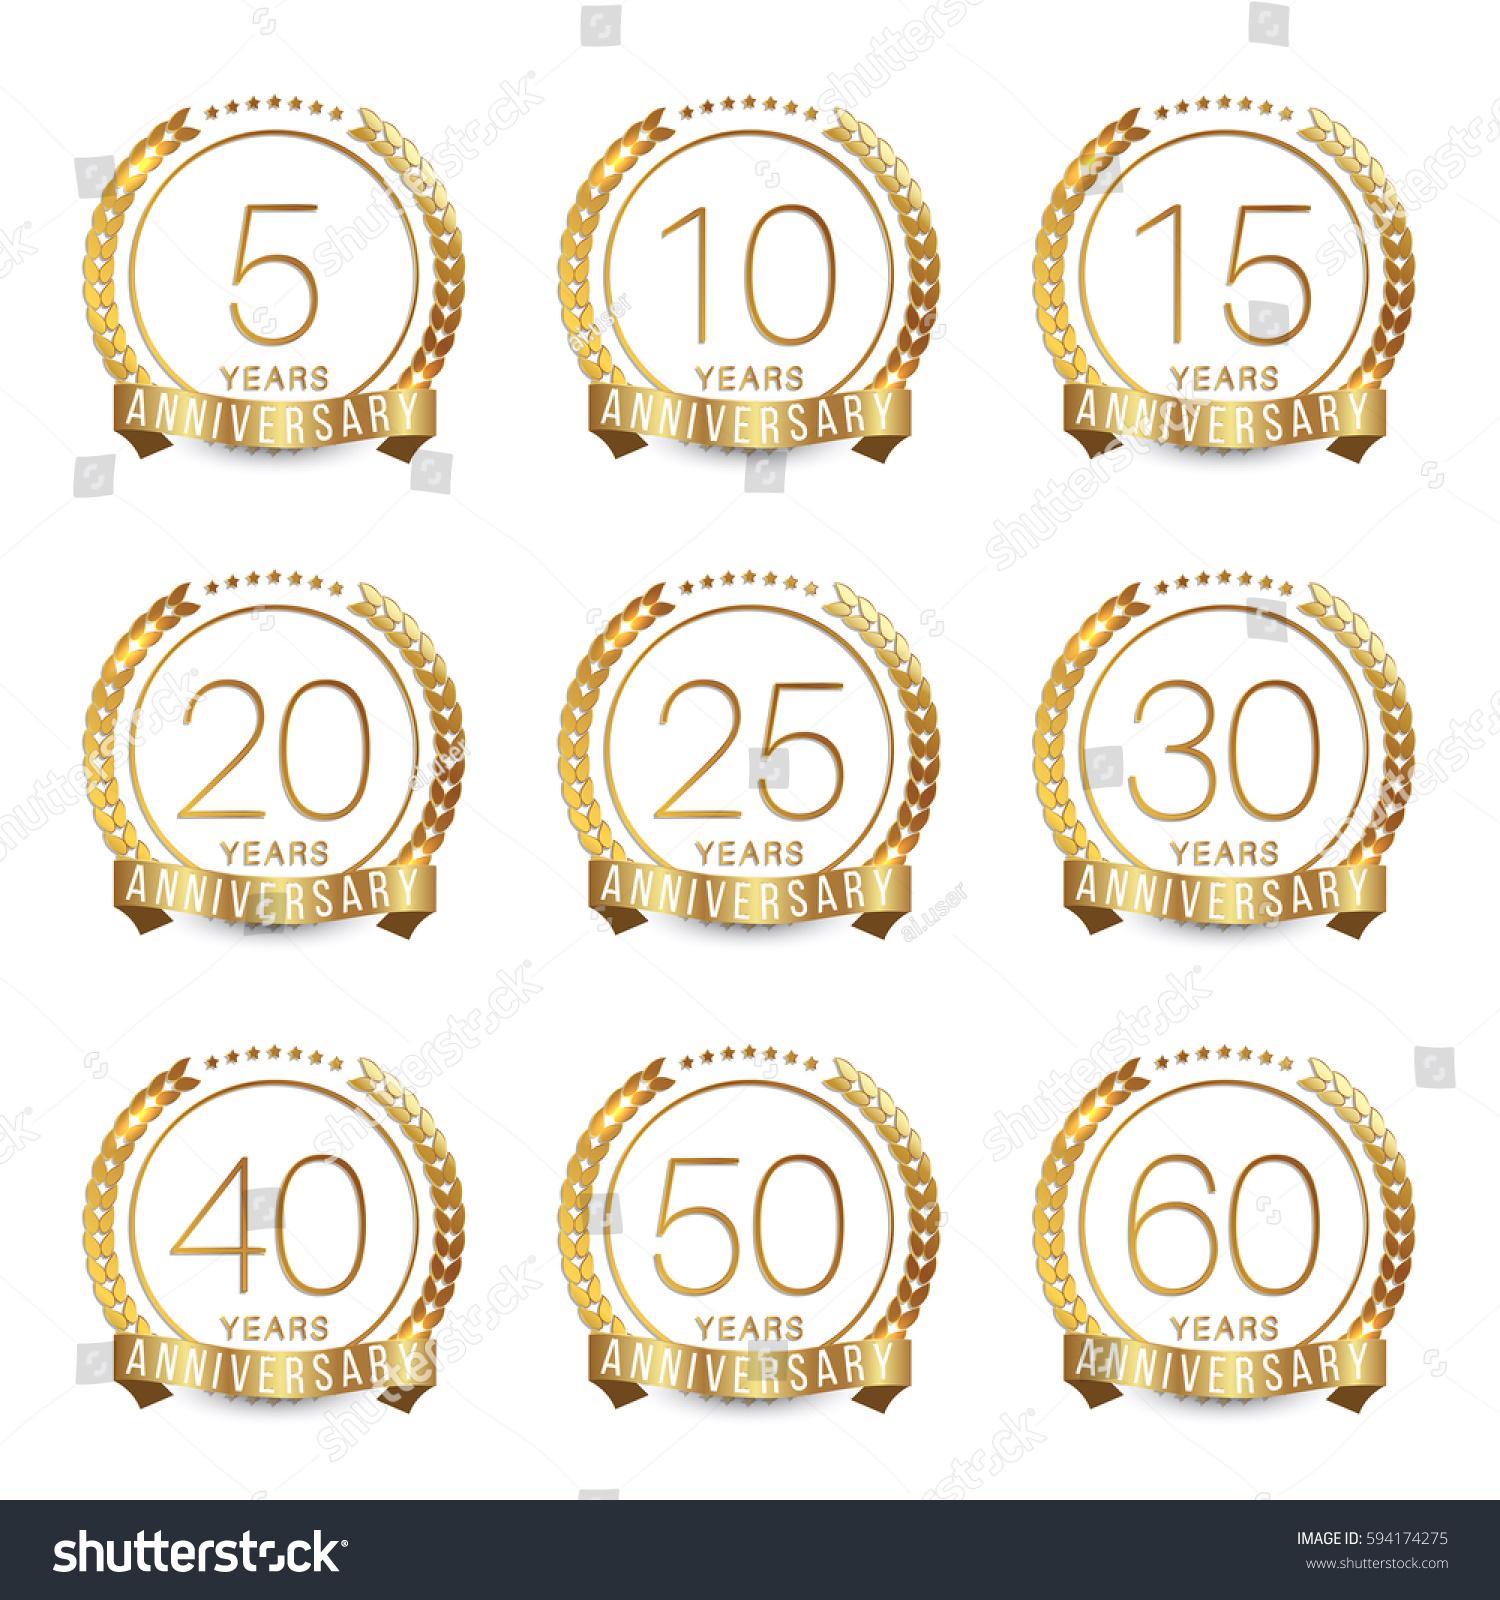 Ninth wedding anniversary symbol images symbol and sign ideas 7th wedding anniversary symbol gallery symbol and sign ideas wedding anniversary forgot wedding anniversary buycottarizona buycottarizona buycottarizona